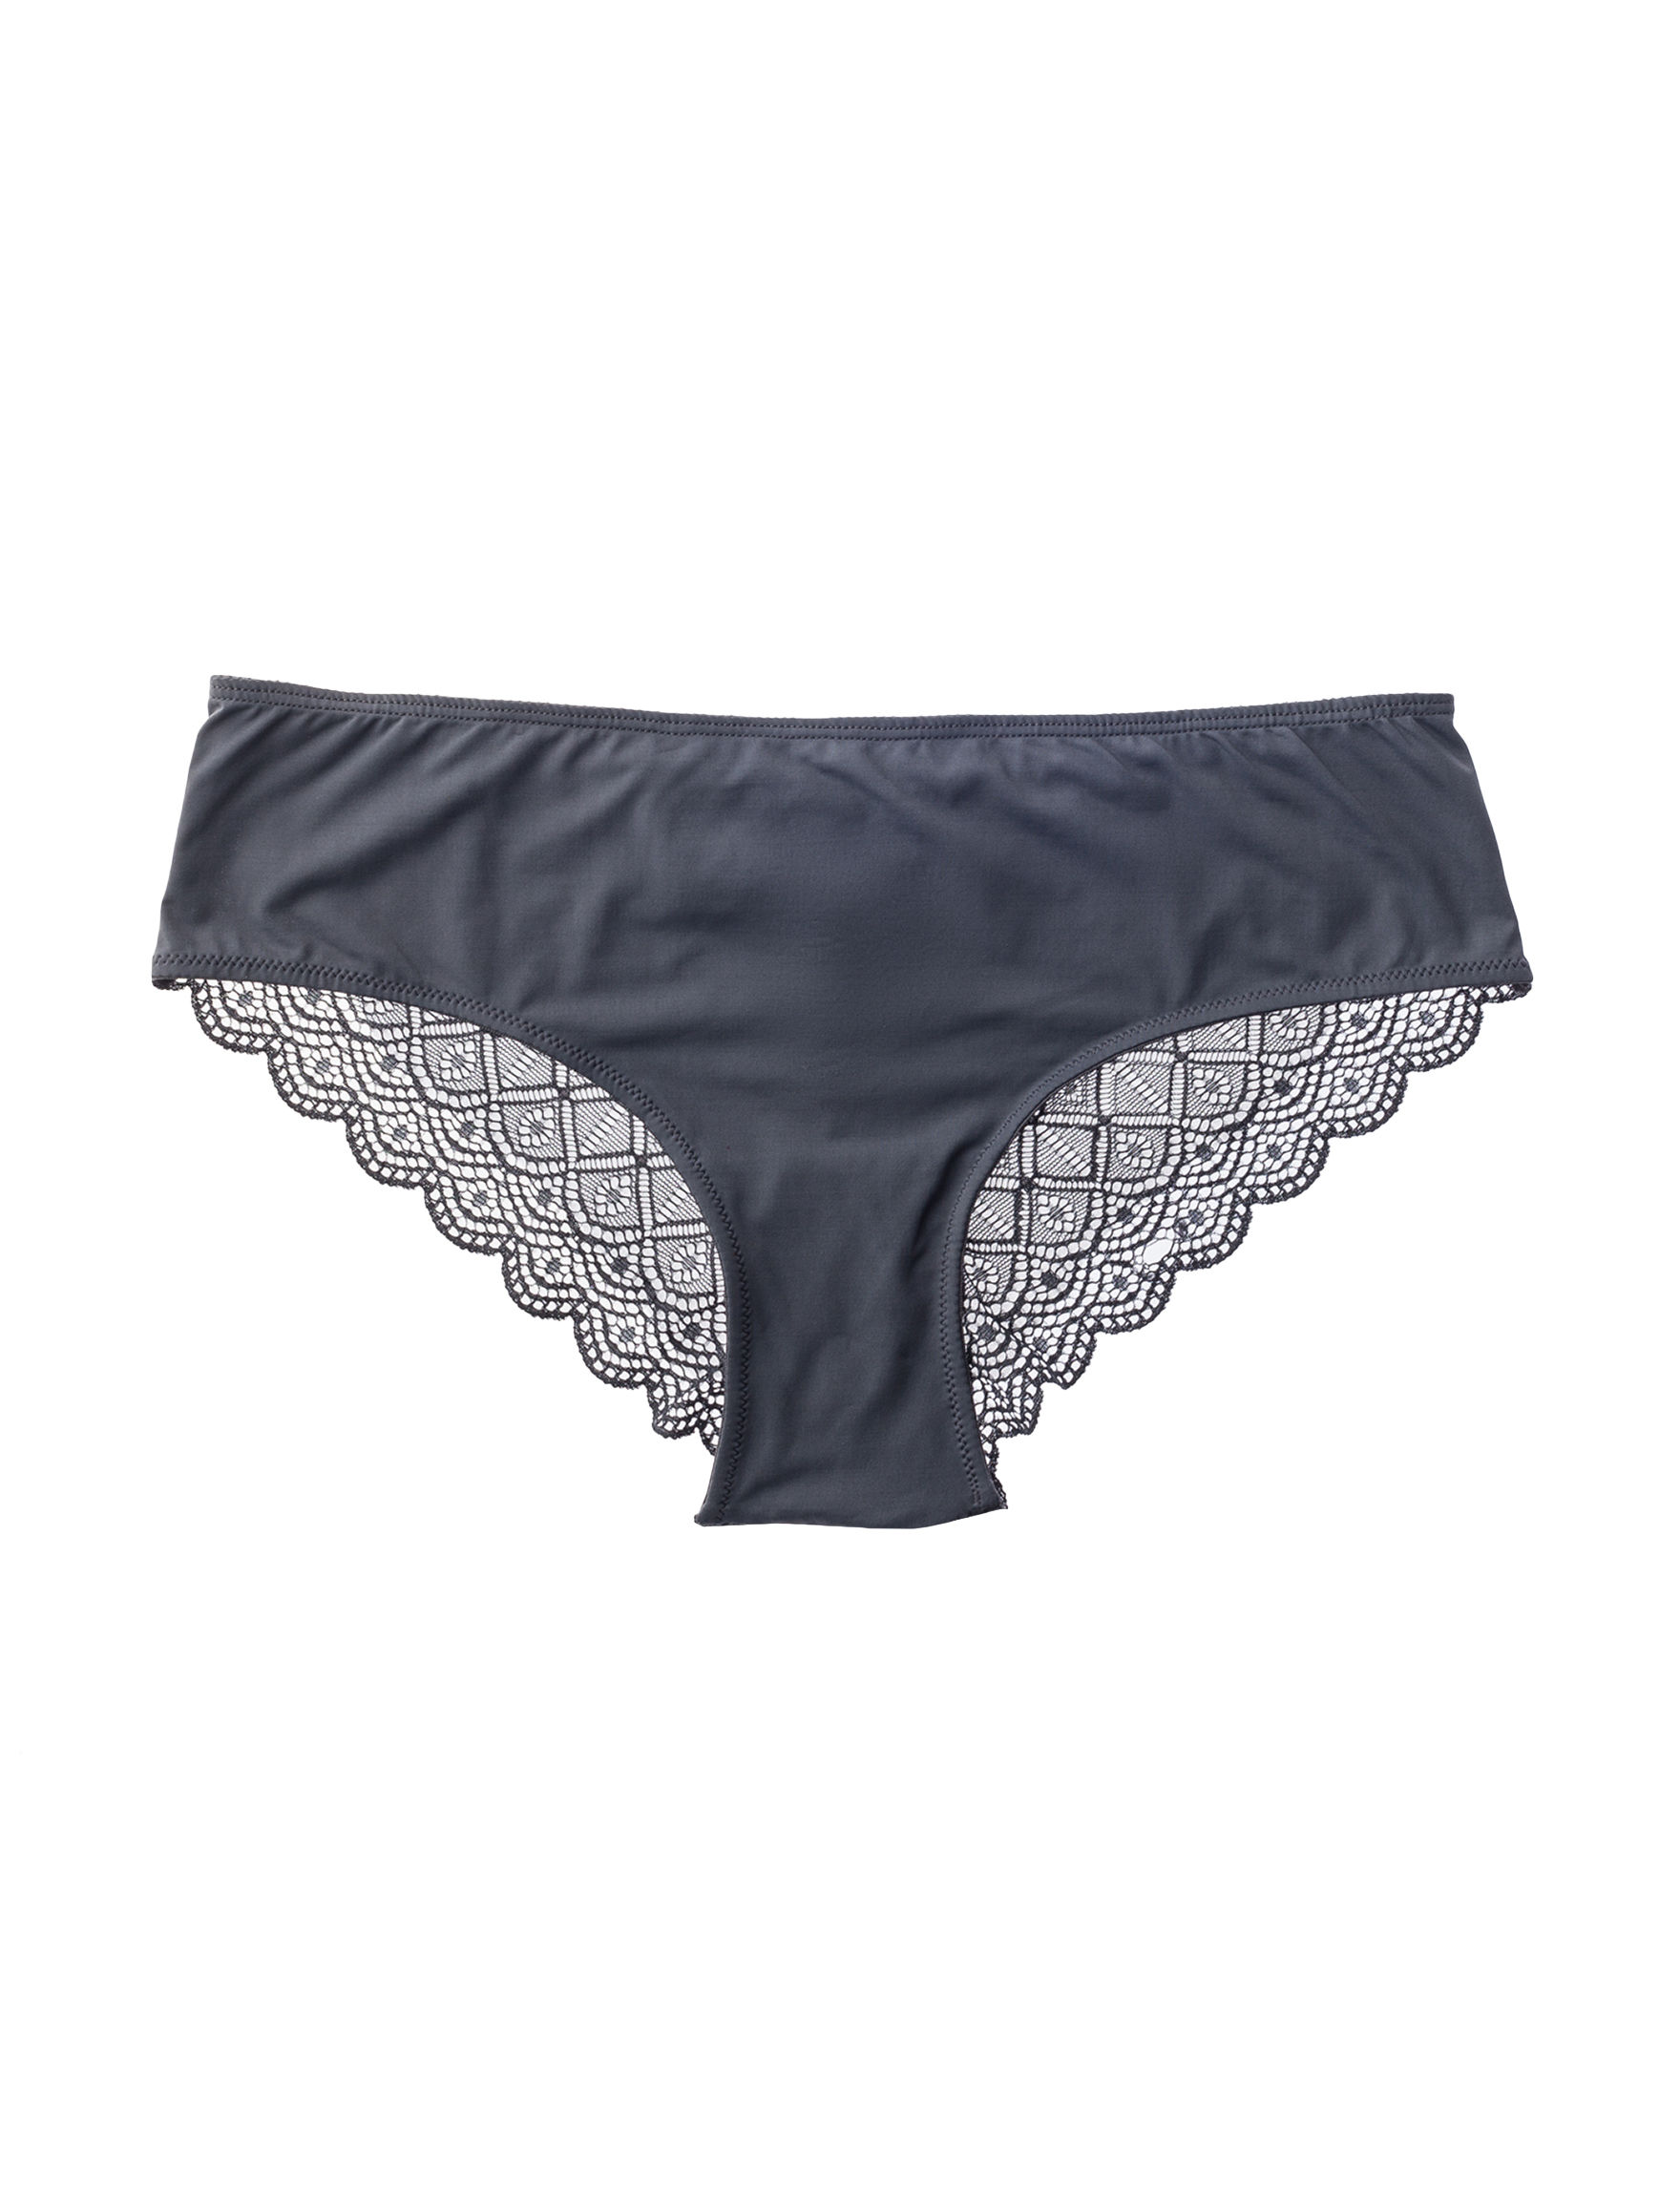 B Intimates Steel Grey Panties Hipster